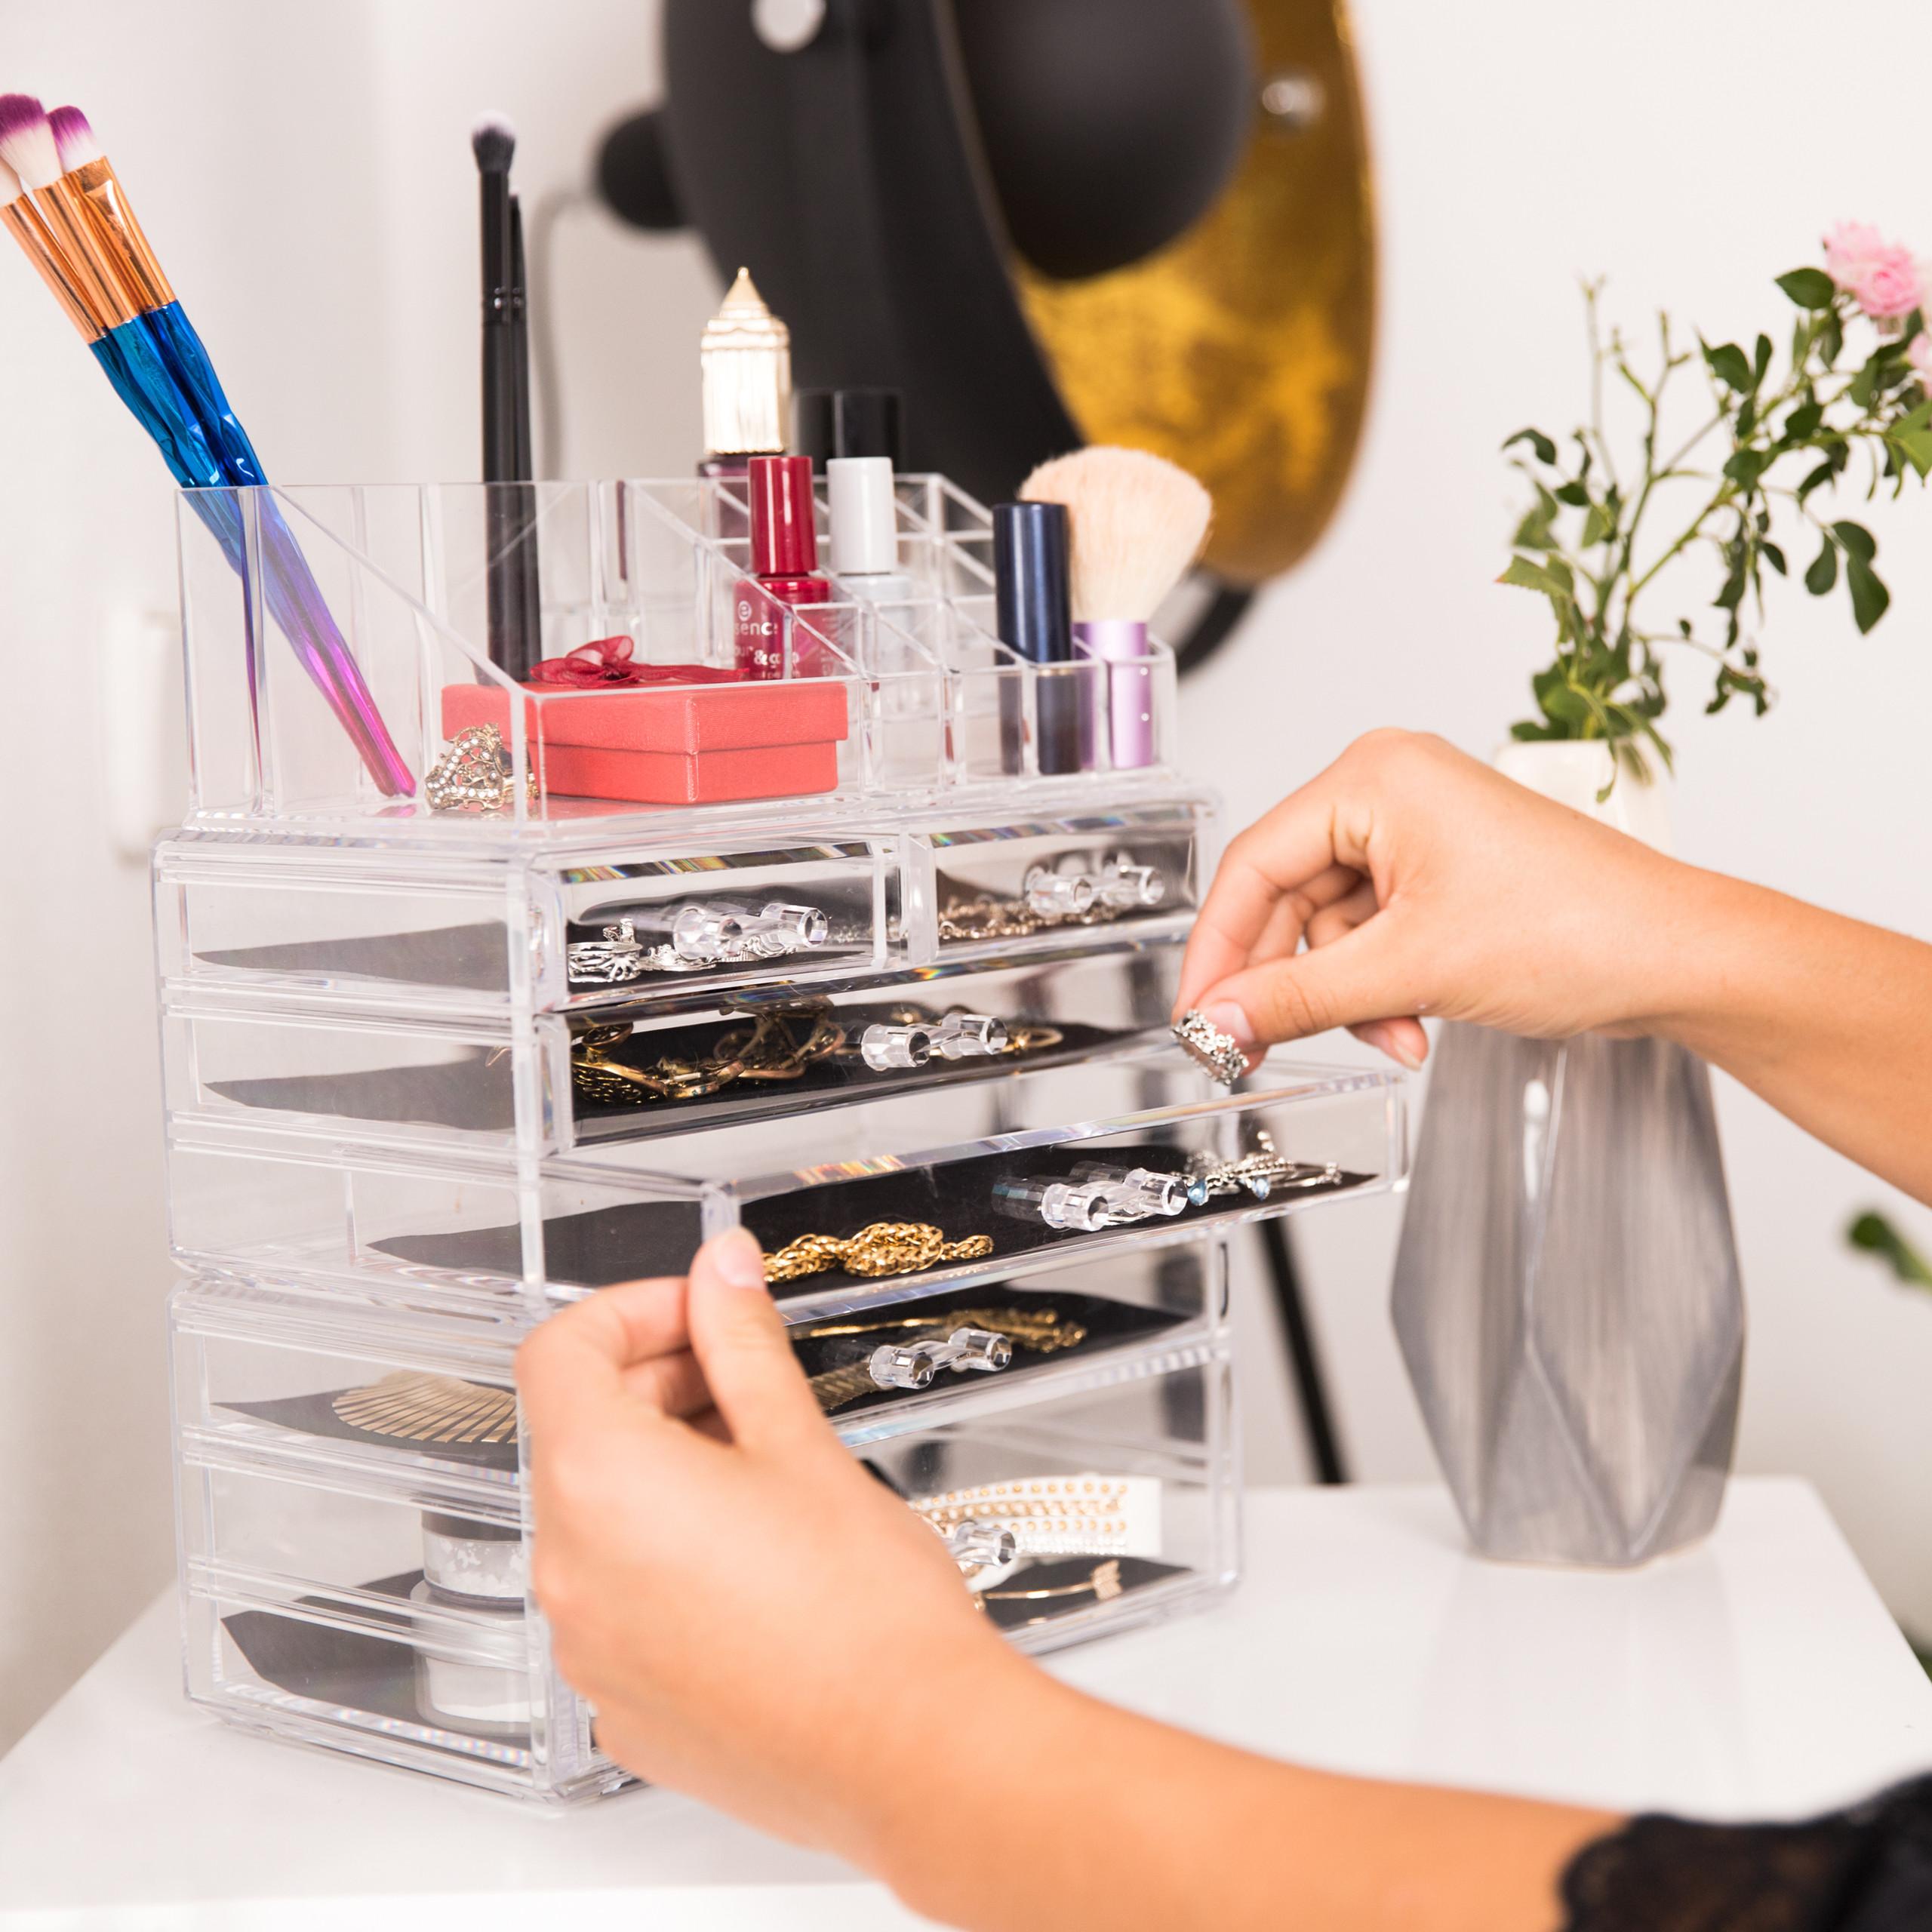 make-up-organizer-opbergen-van-cosmetica-acryl-stapelbaar-met-lades miniatuur 12